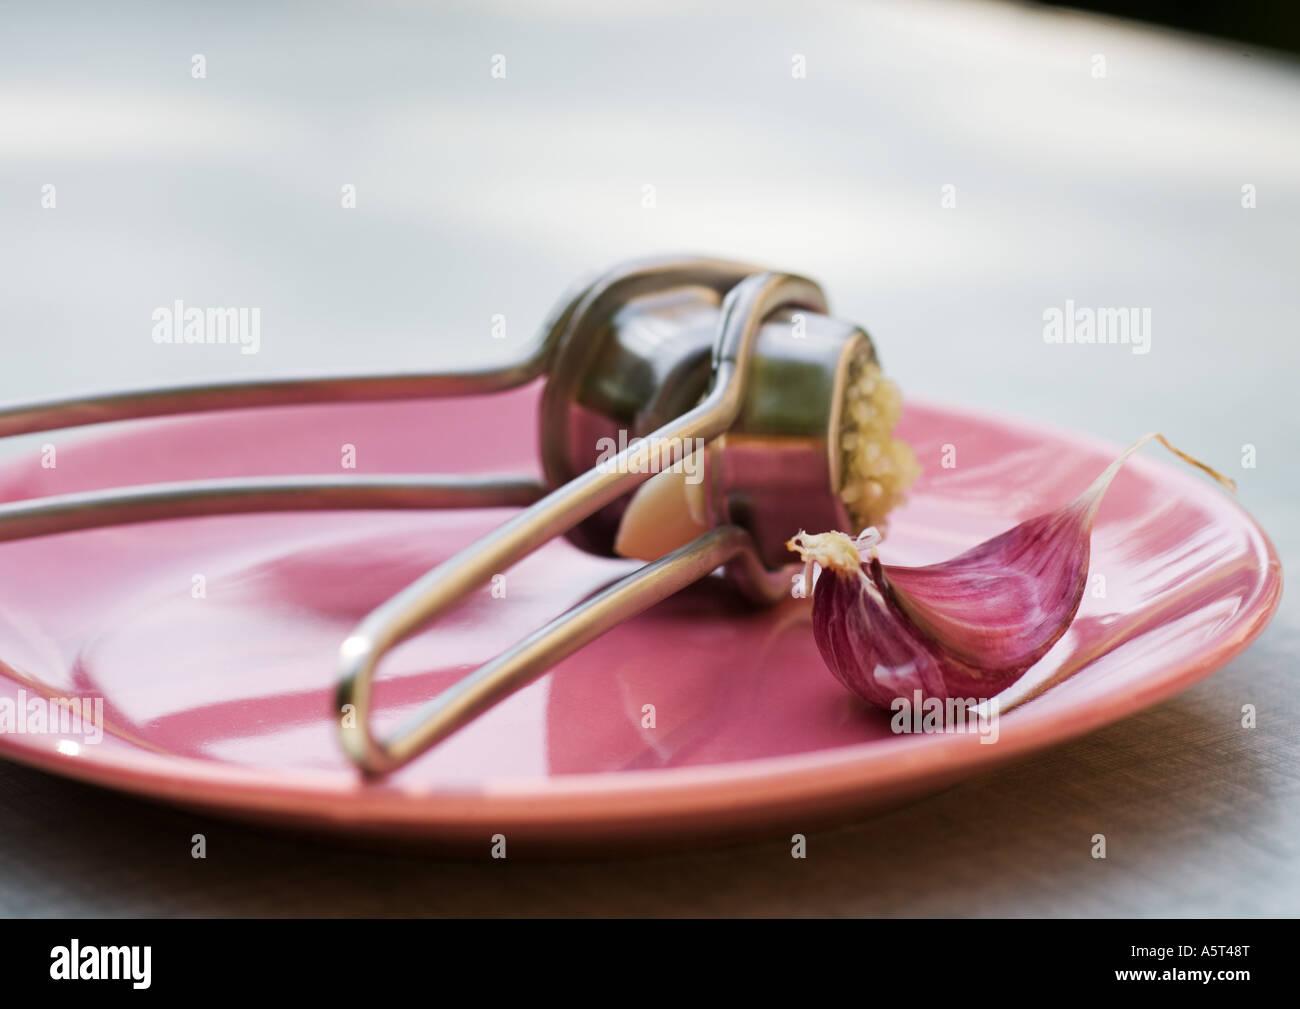 Garlic press and clove of garlic on plate - Stock Image